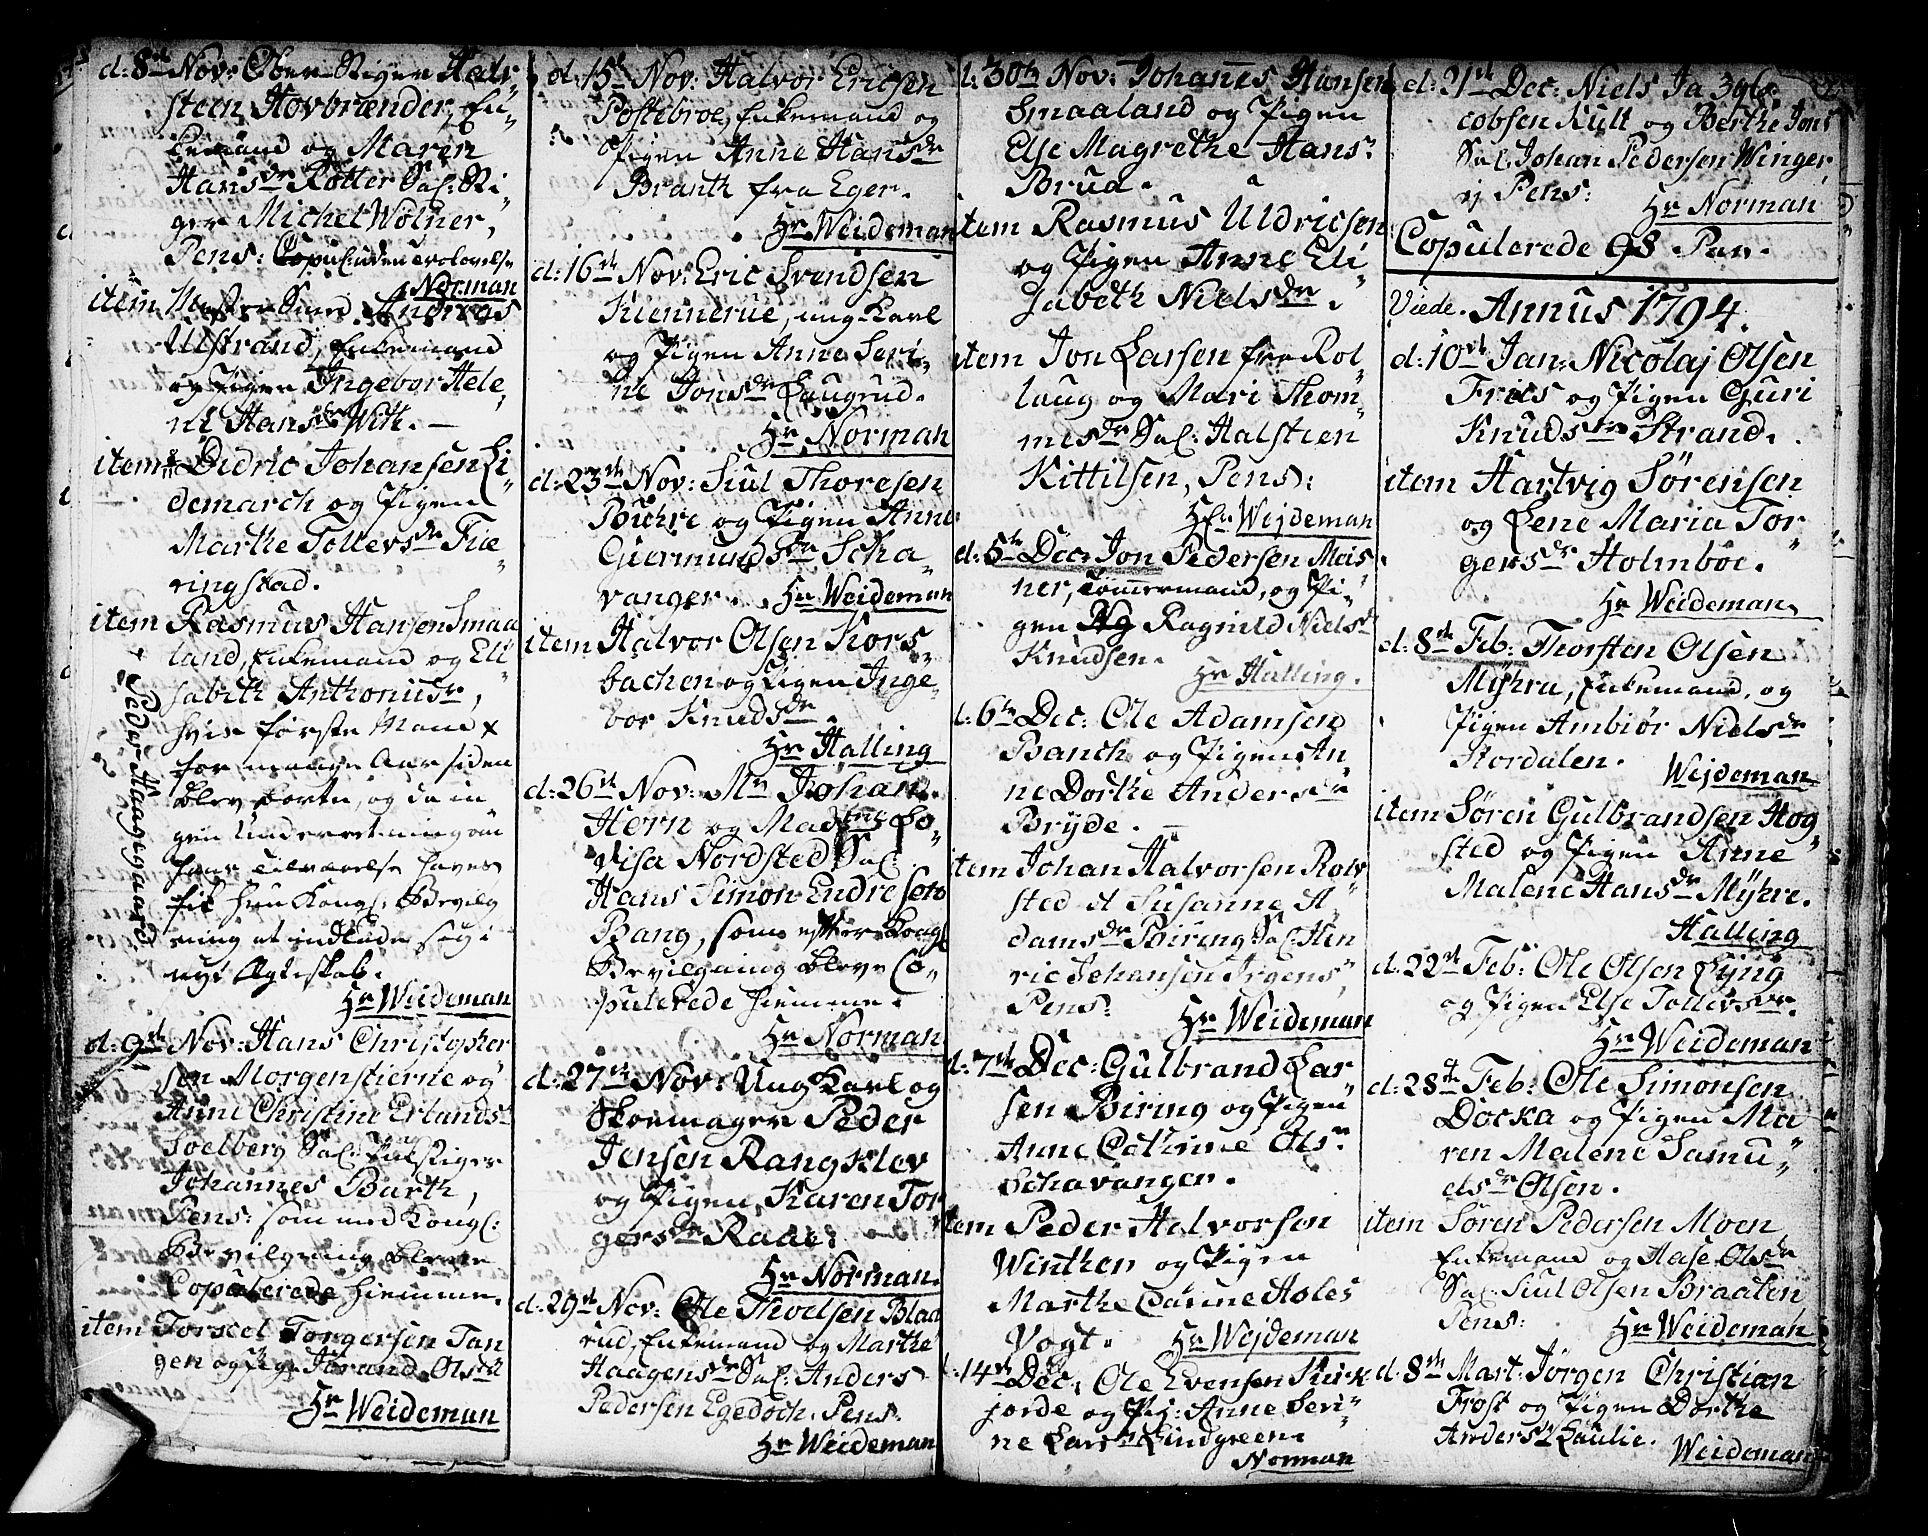 SAKO, Kongsberg kirkebøker, F/Fa/L0006: Parish register (official) no. I 6, 1783-1797, p. 396